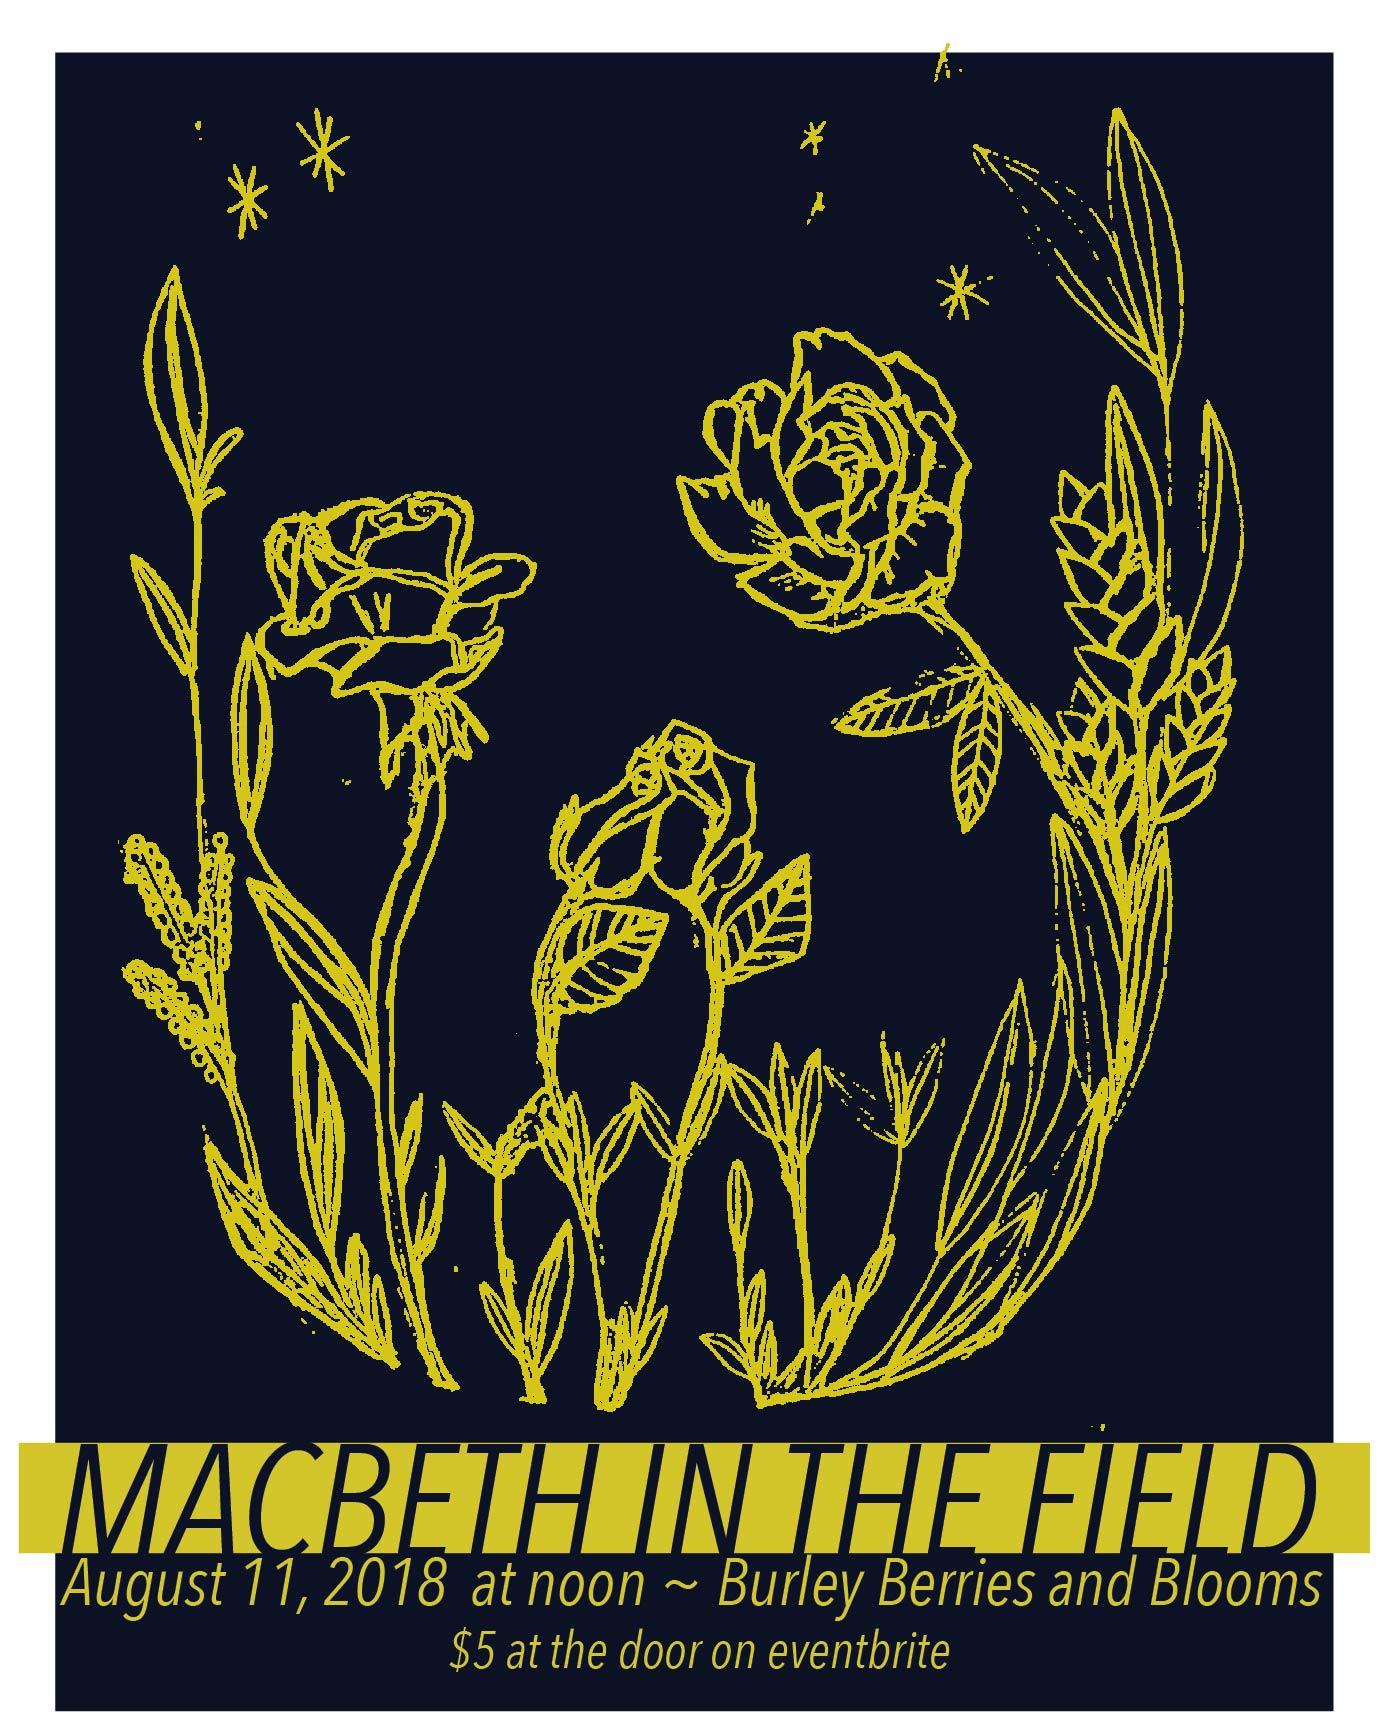 Macbeth in the Field